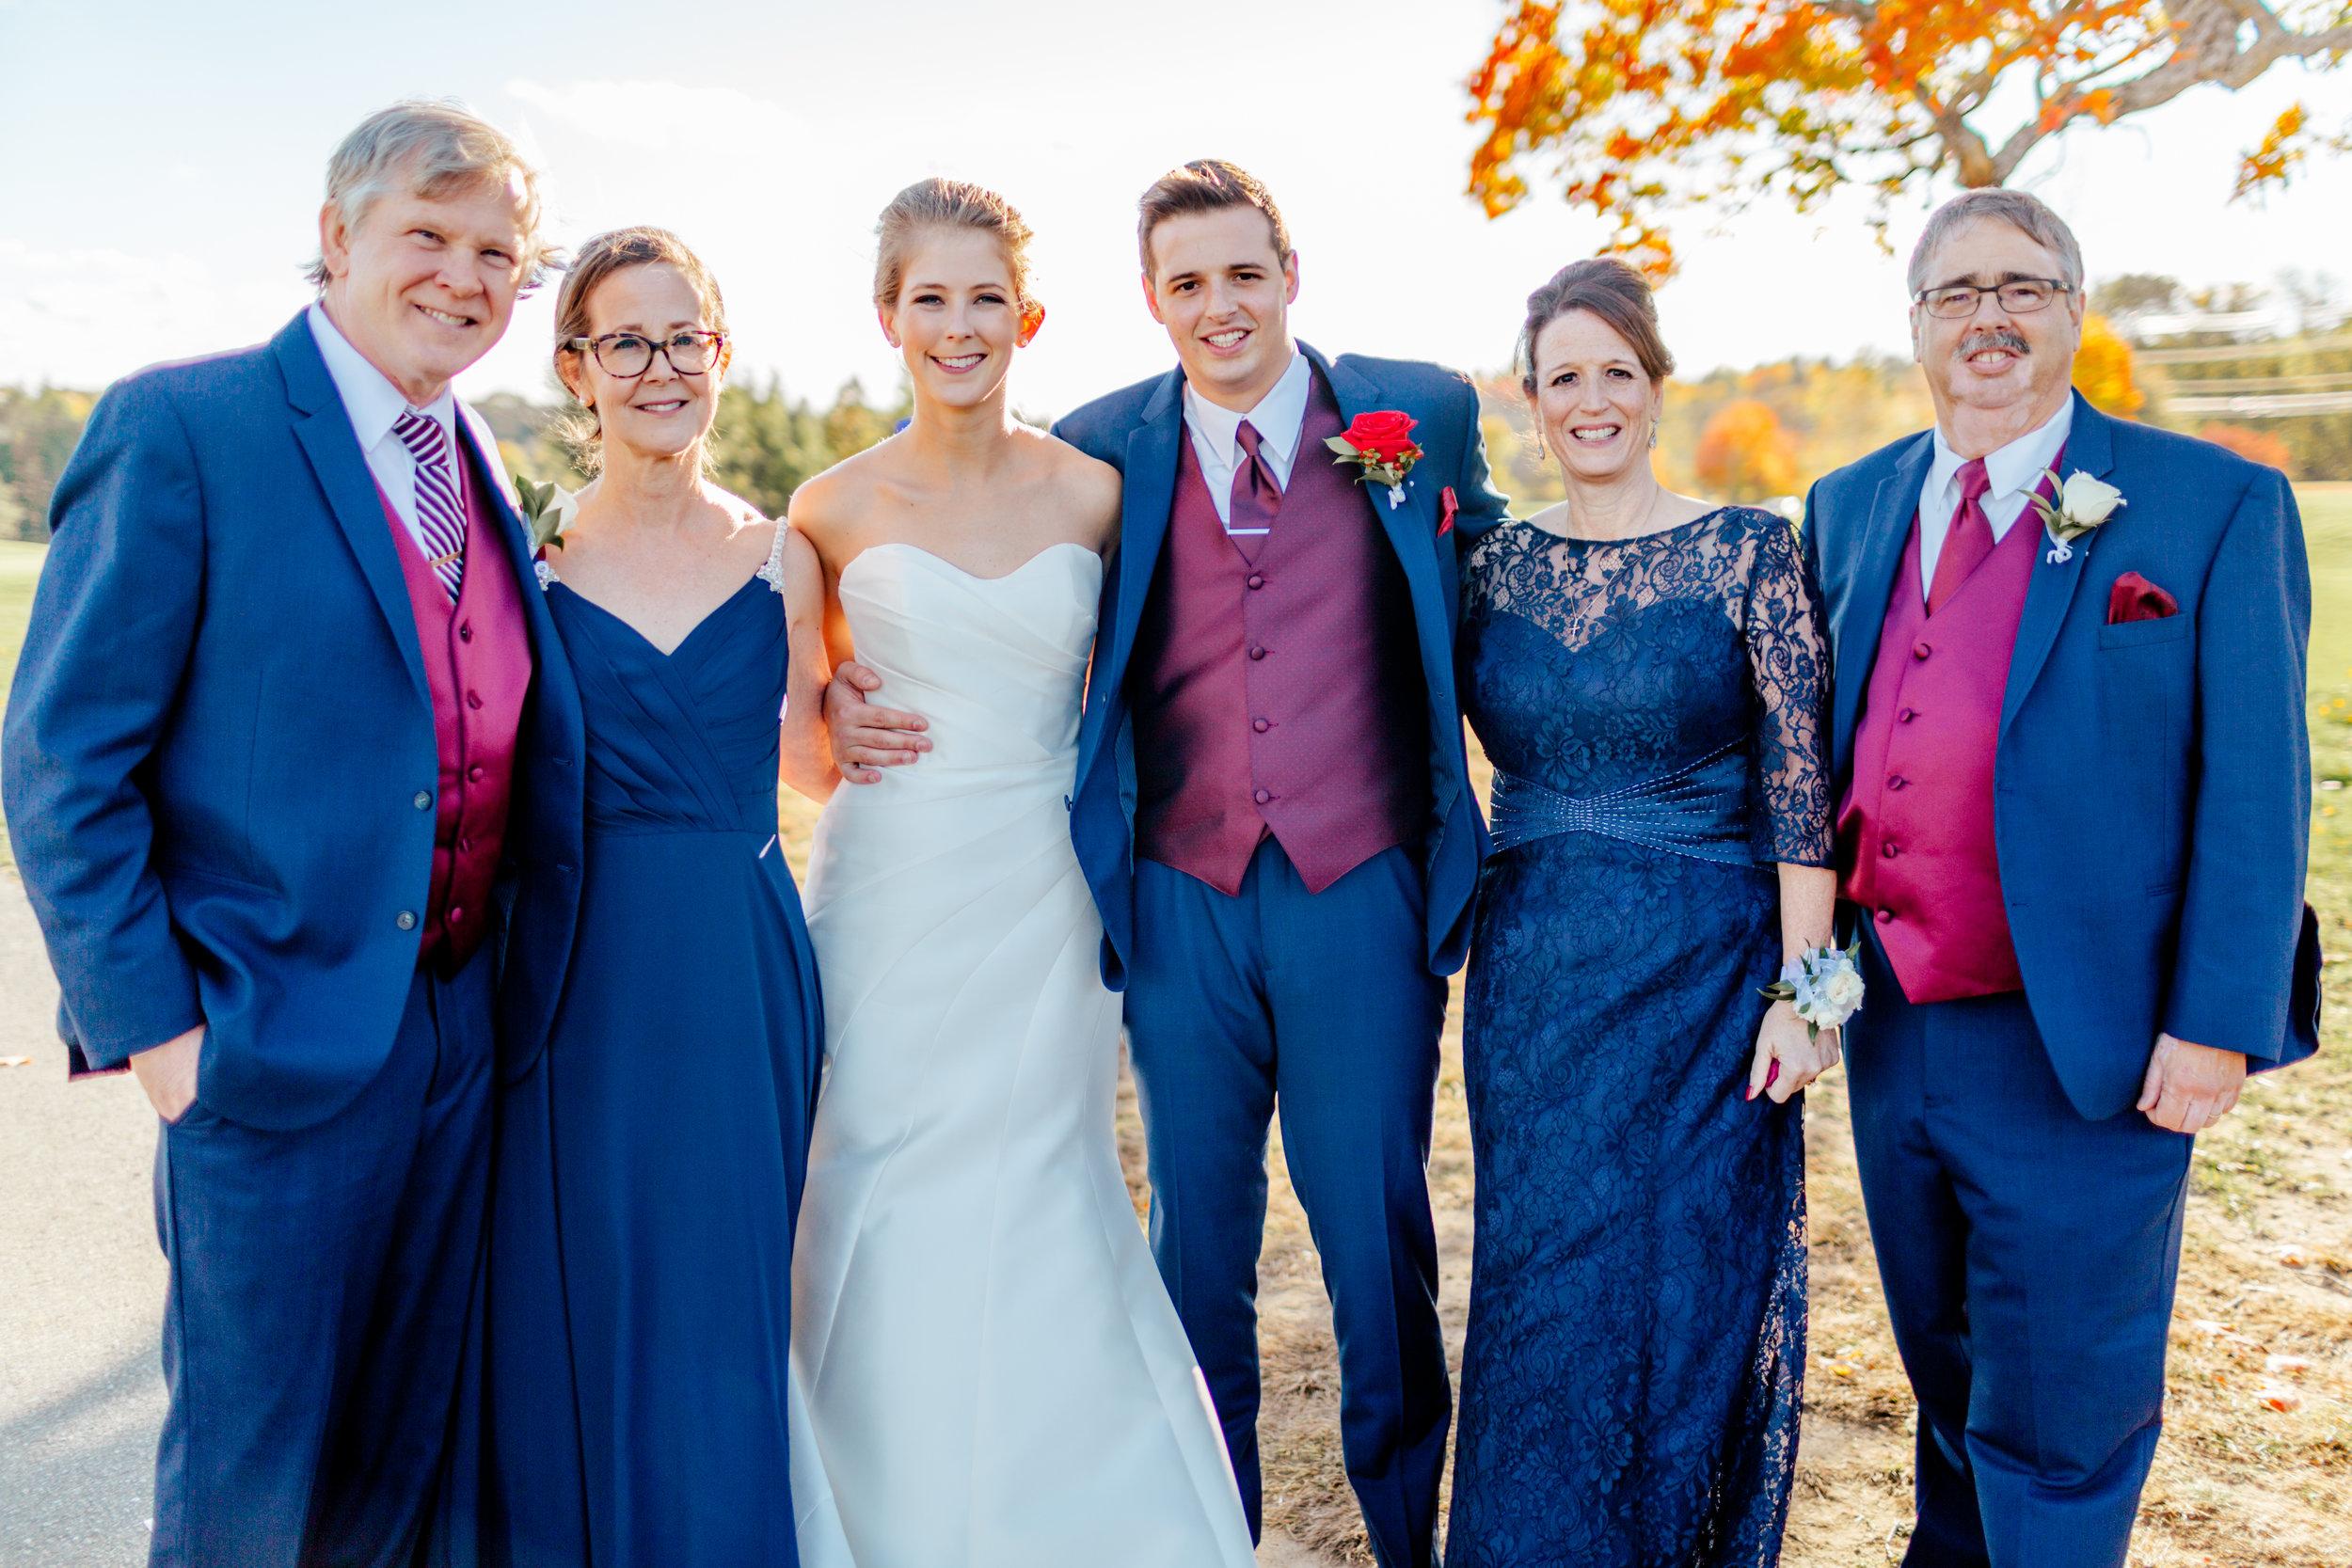 Jeff-and-Leslie-Wedding -8297.jpg